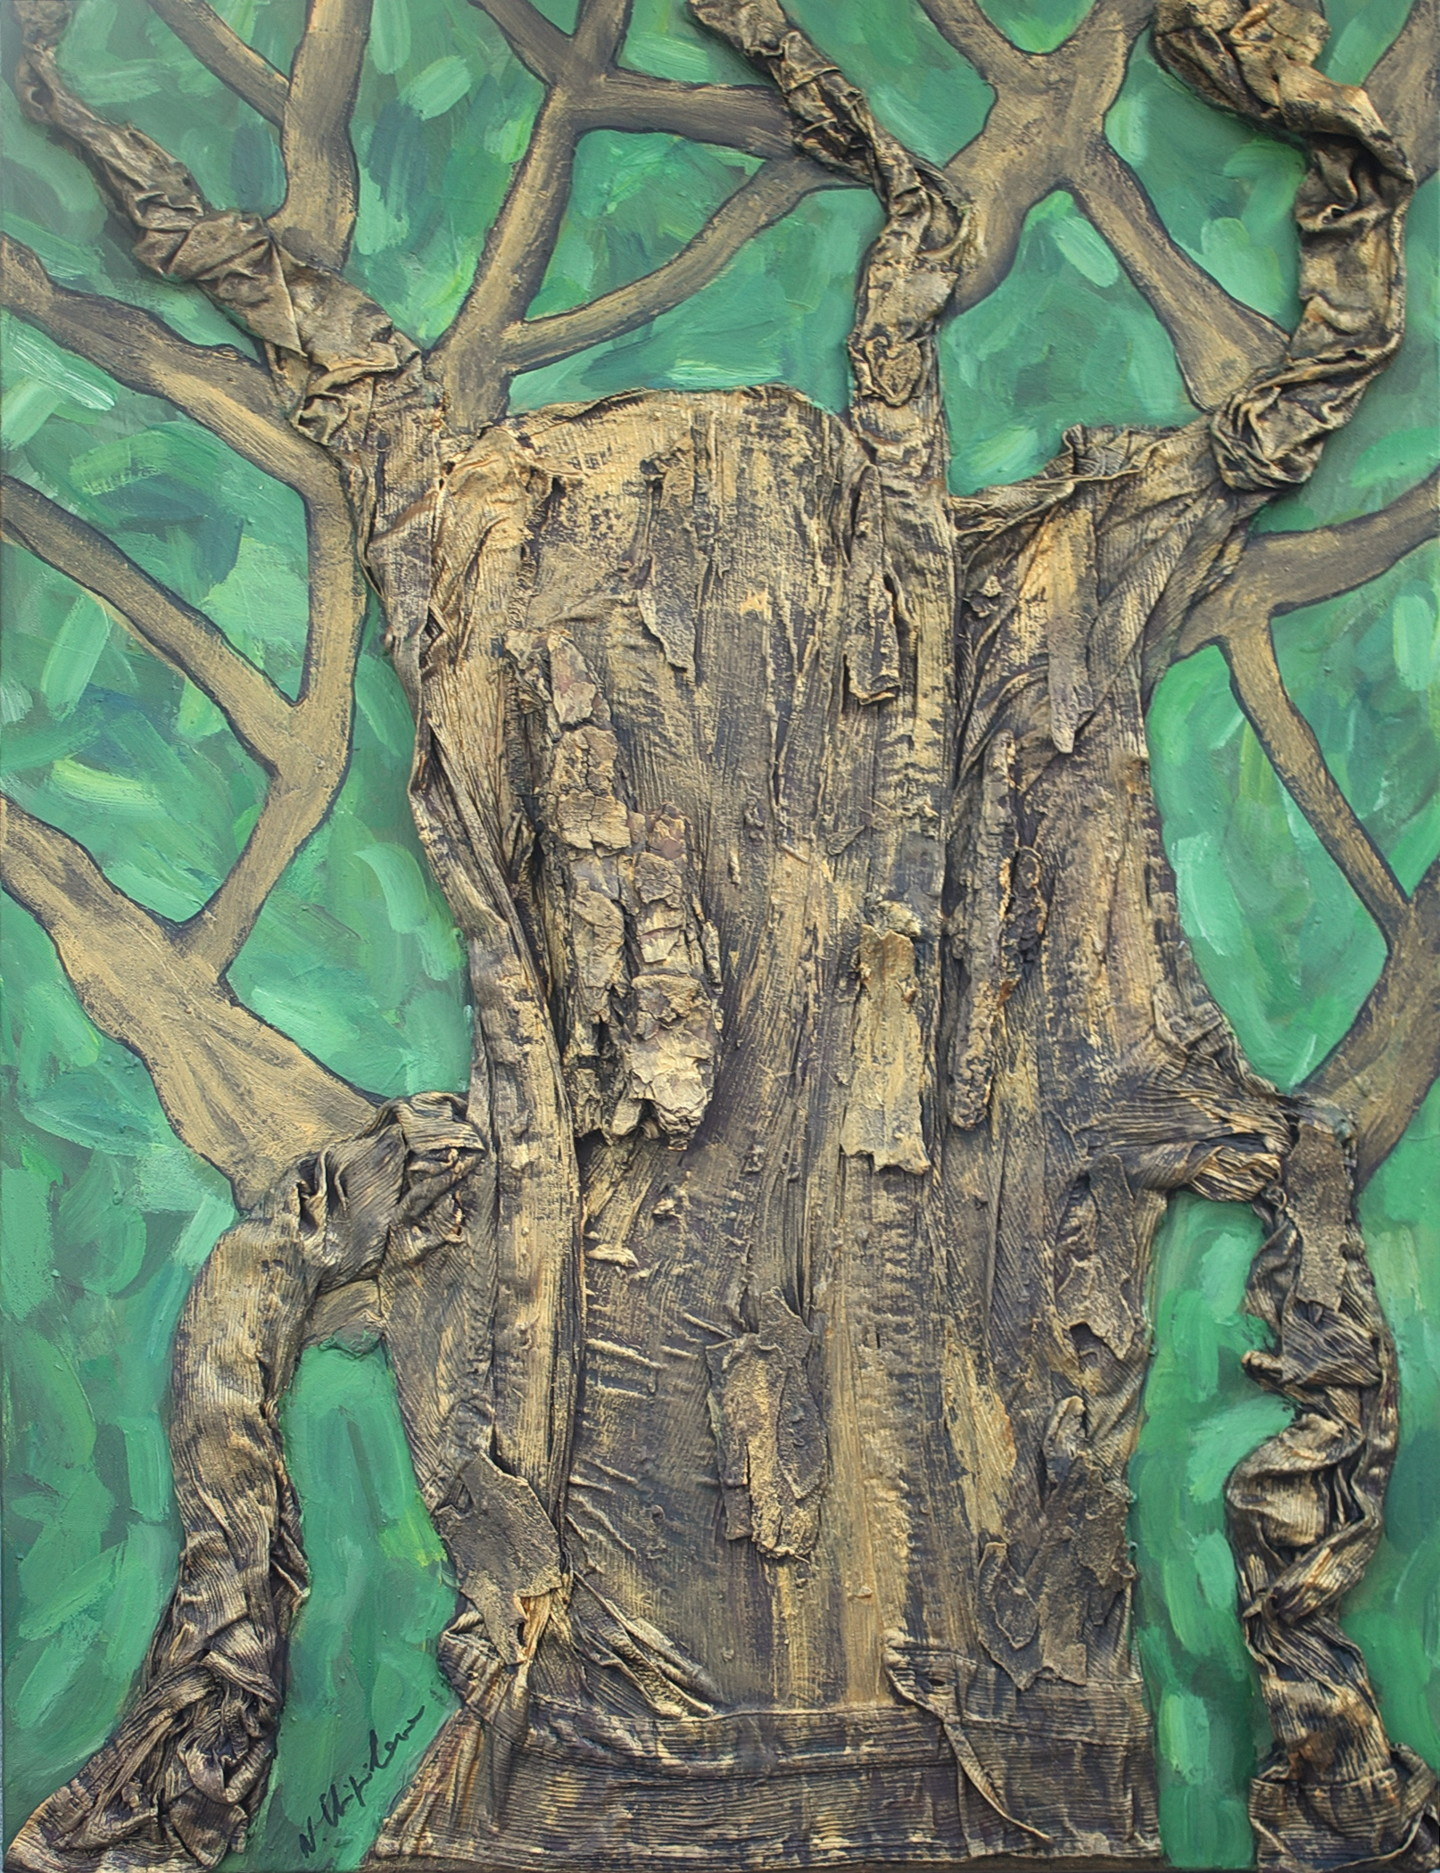 Nath Chipilova (Atelier NN art store) - Golden Shirt Tree Part 5